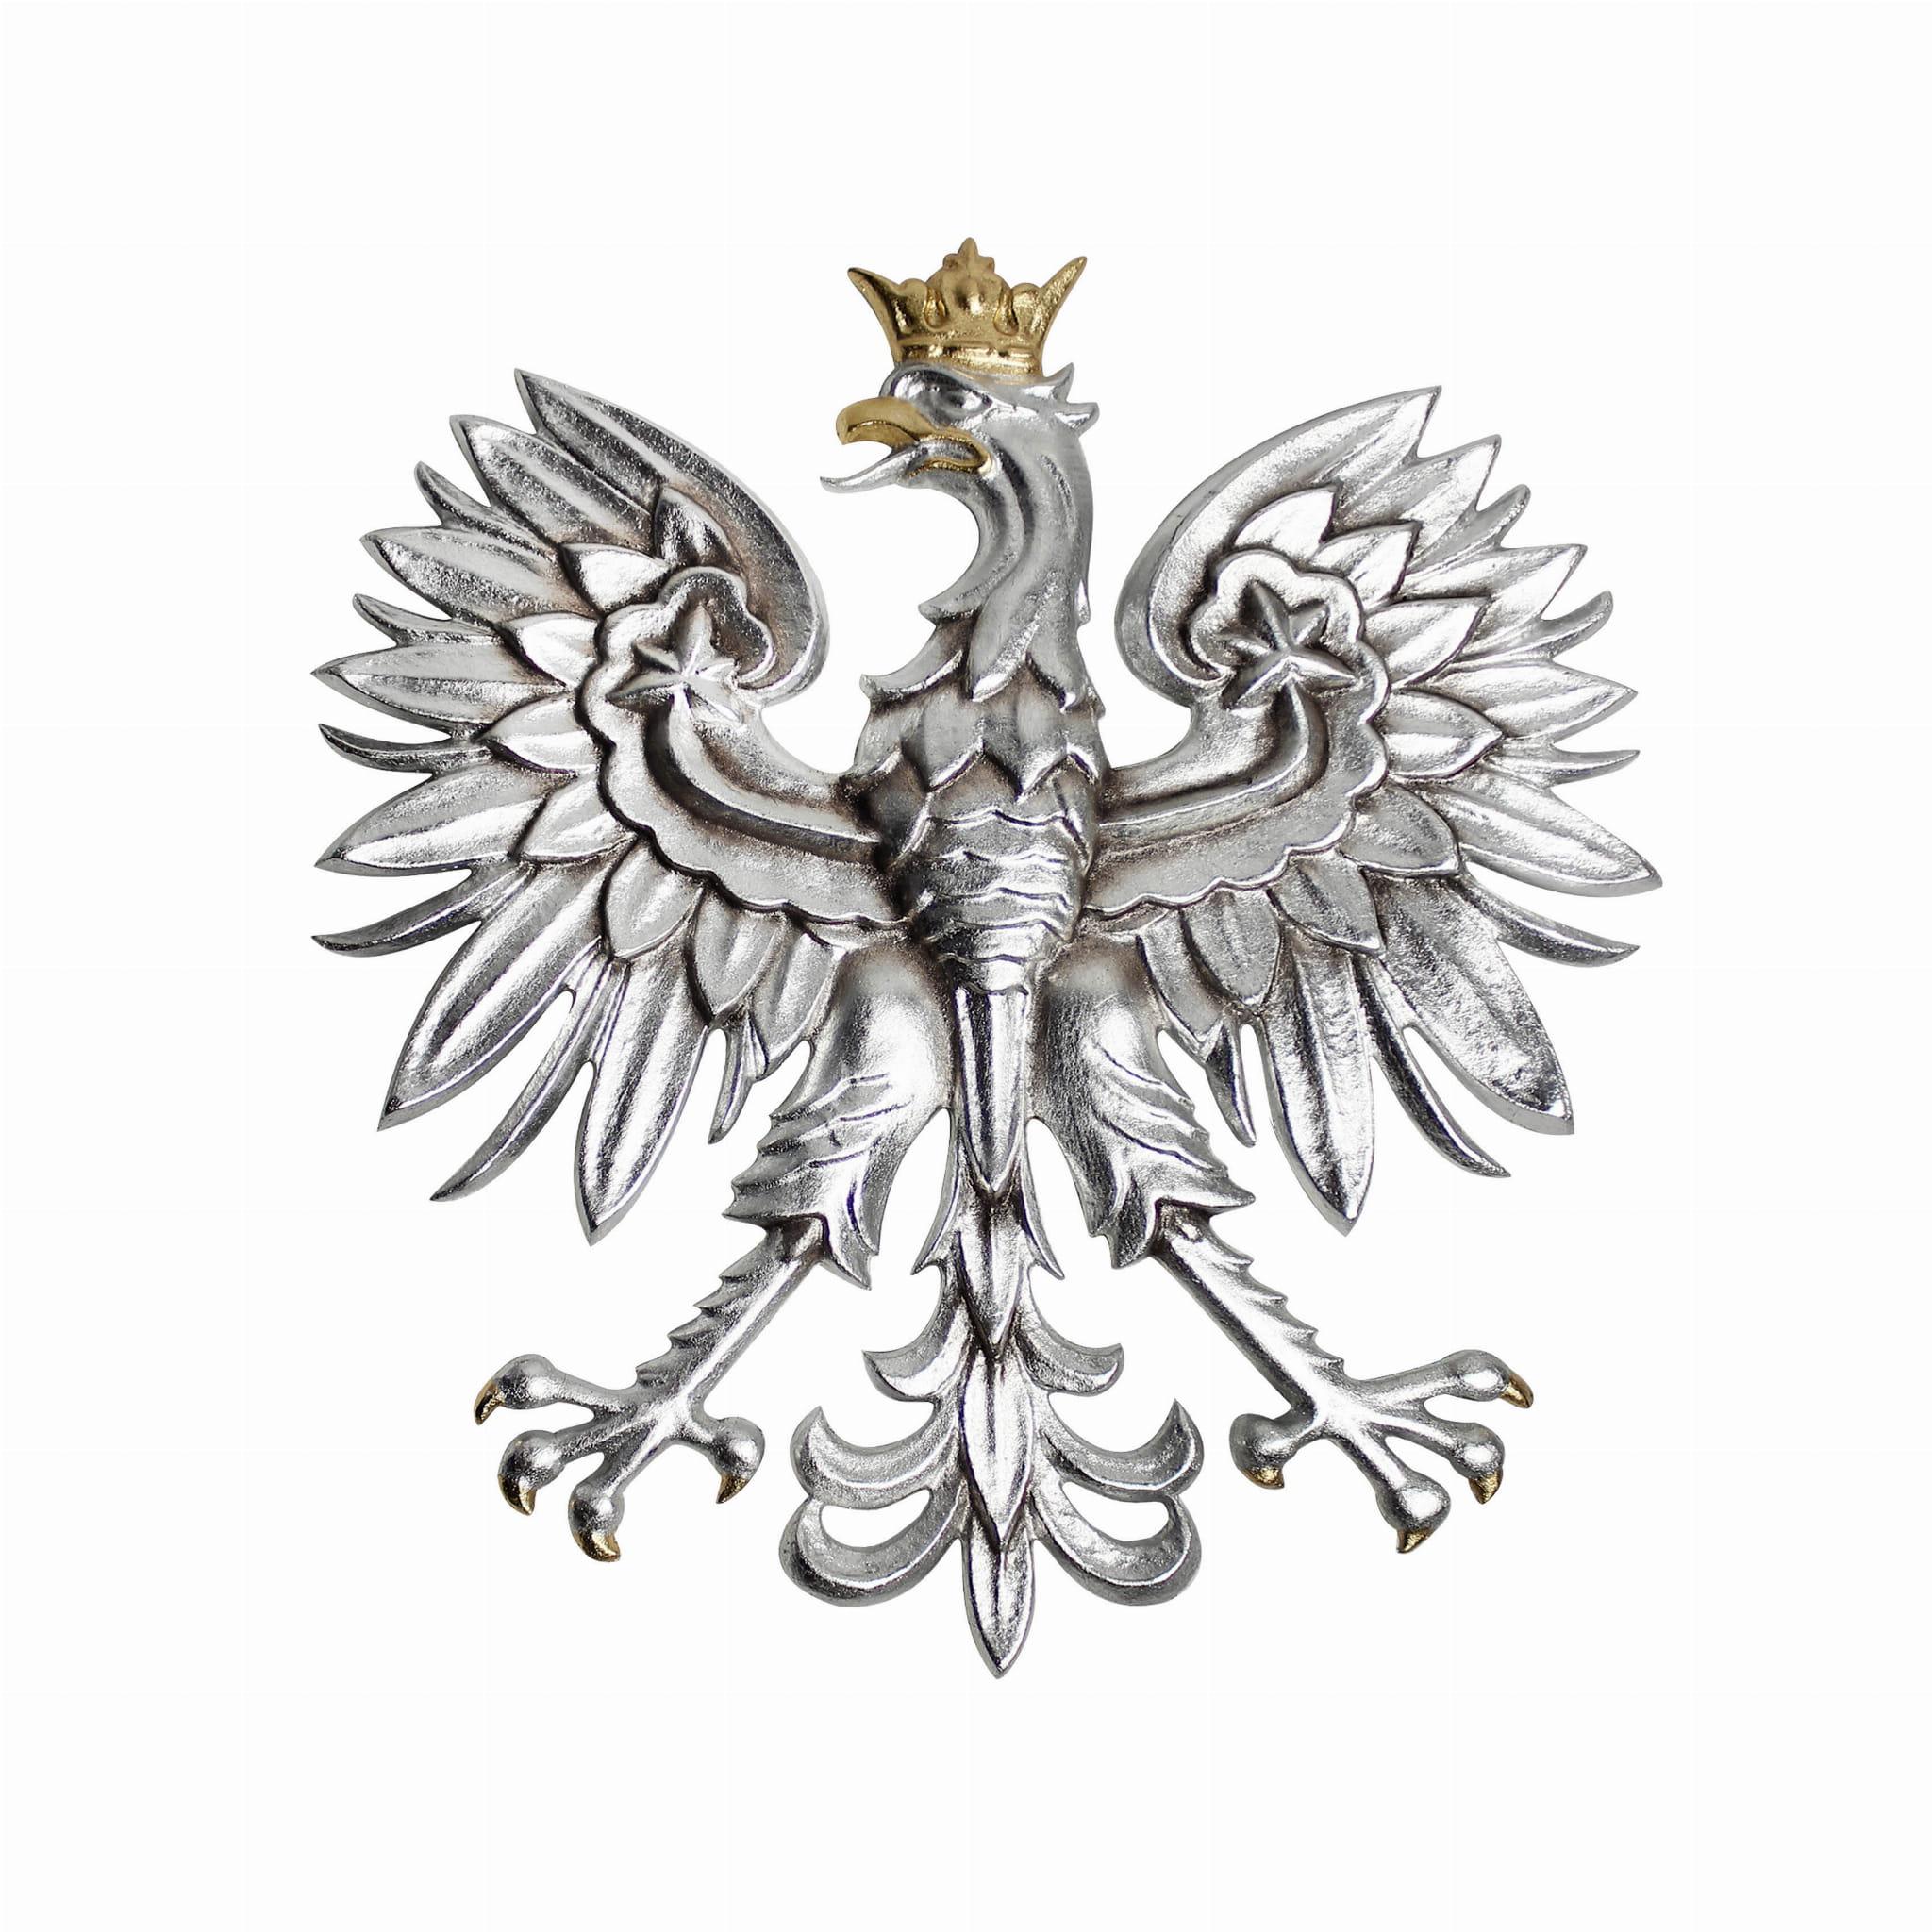 Godlo Polskie Slava Republic